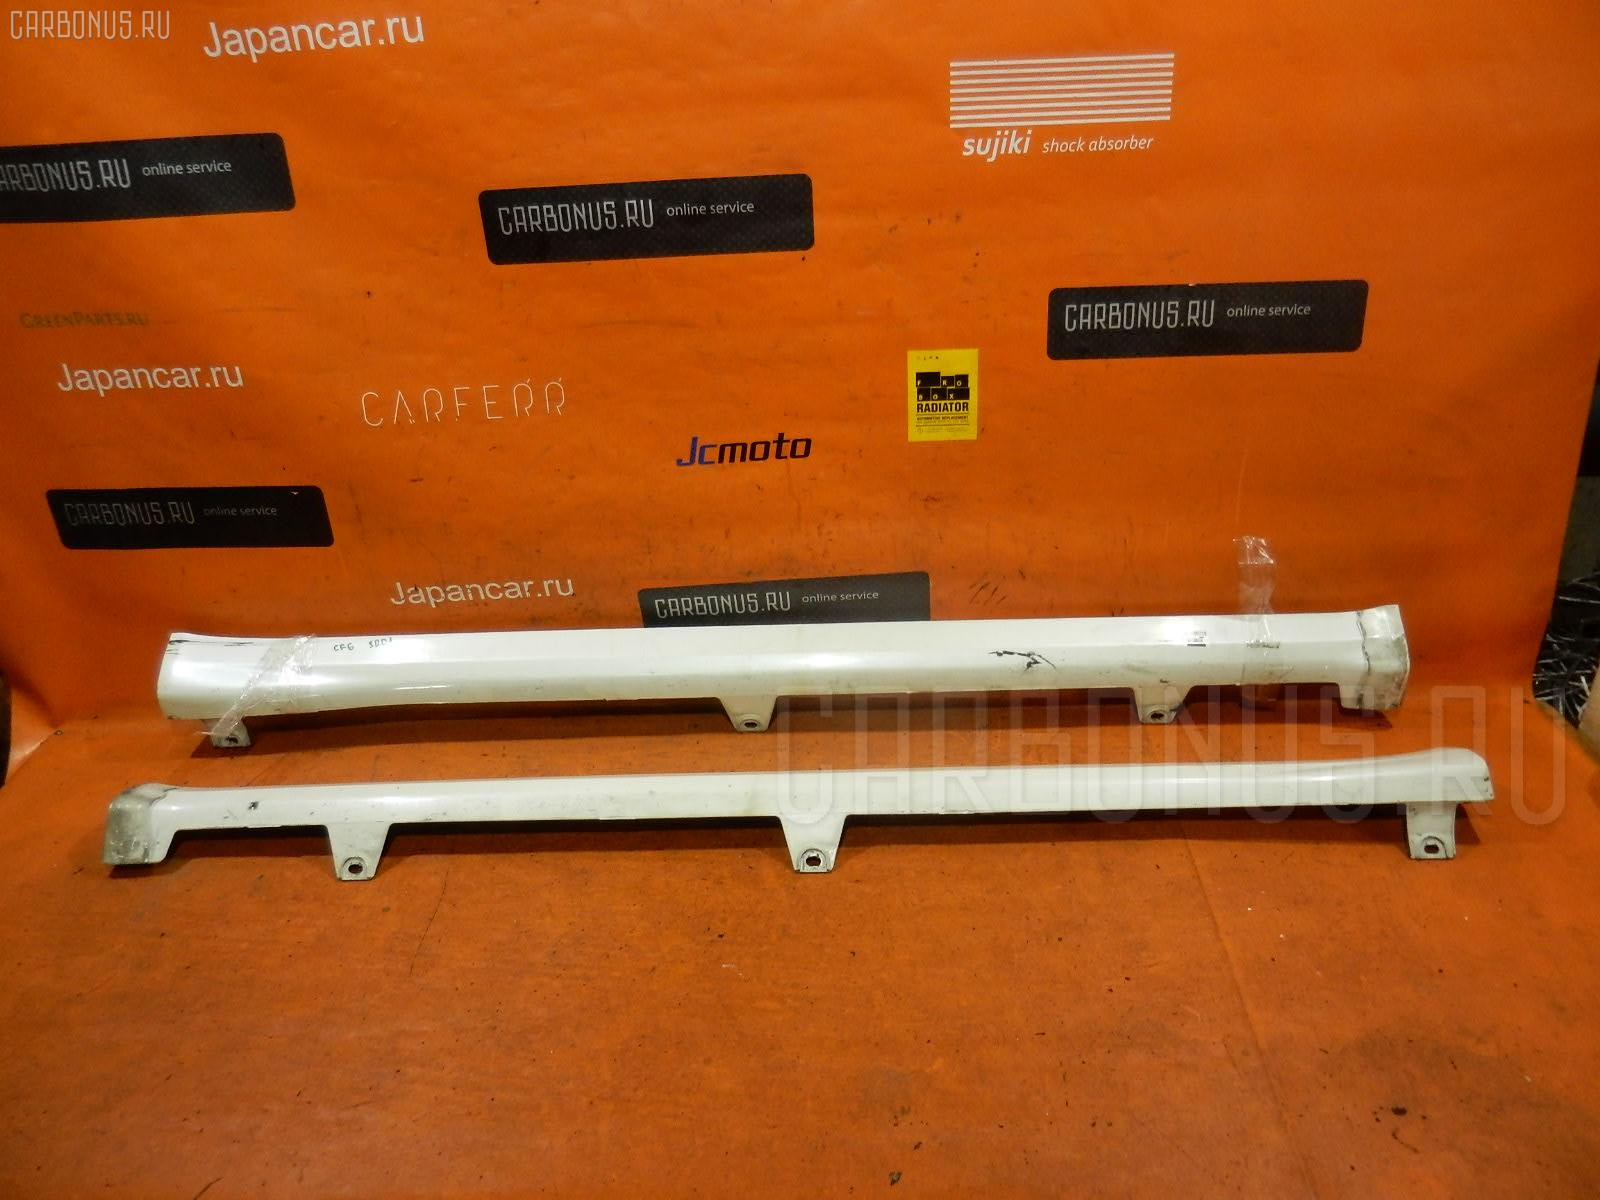 Порог кузова пластиковый ( обвес ) HONDA ACCORD WAGON CF6 Фото 4